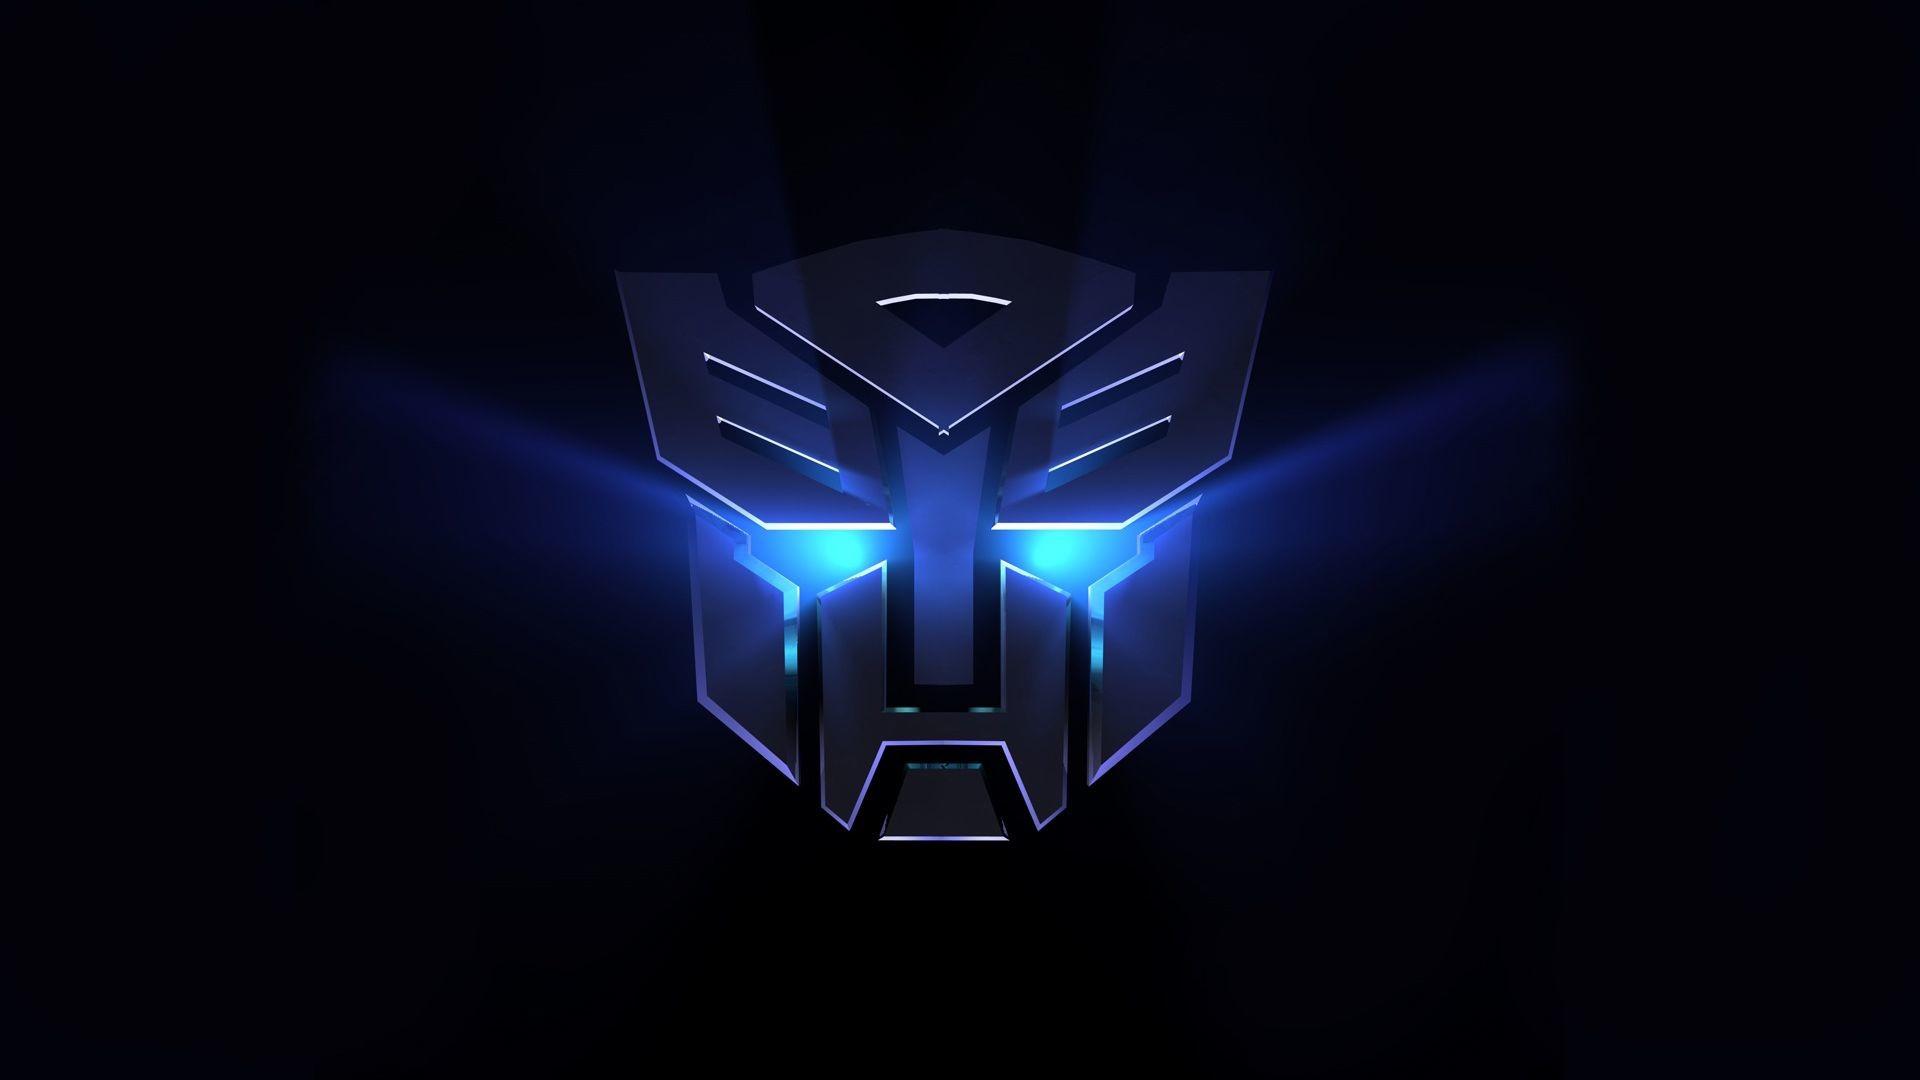 Transformers-Logo-Wallpaper-HD-Dekstop.jpg